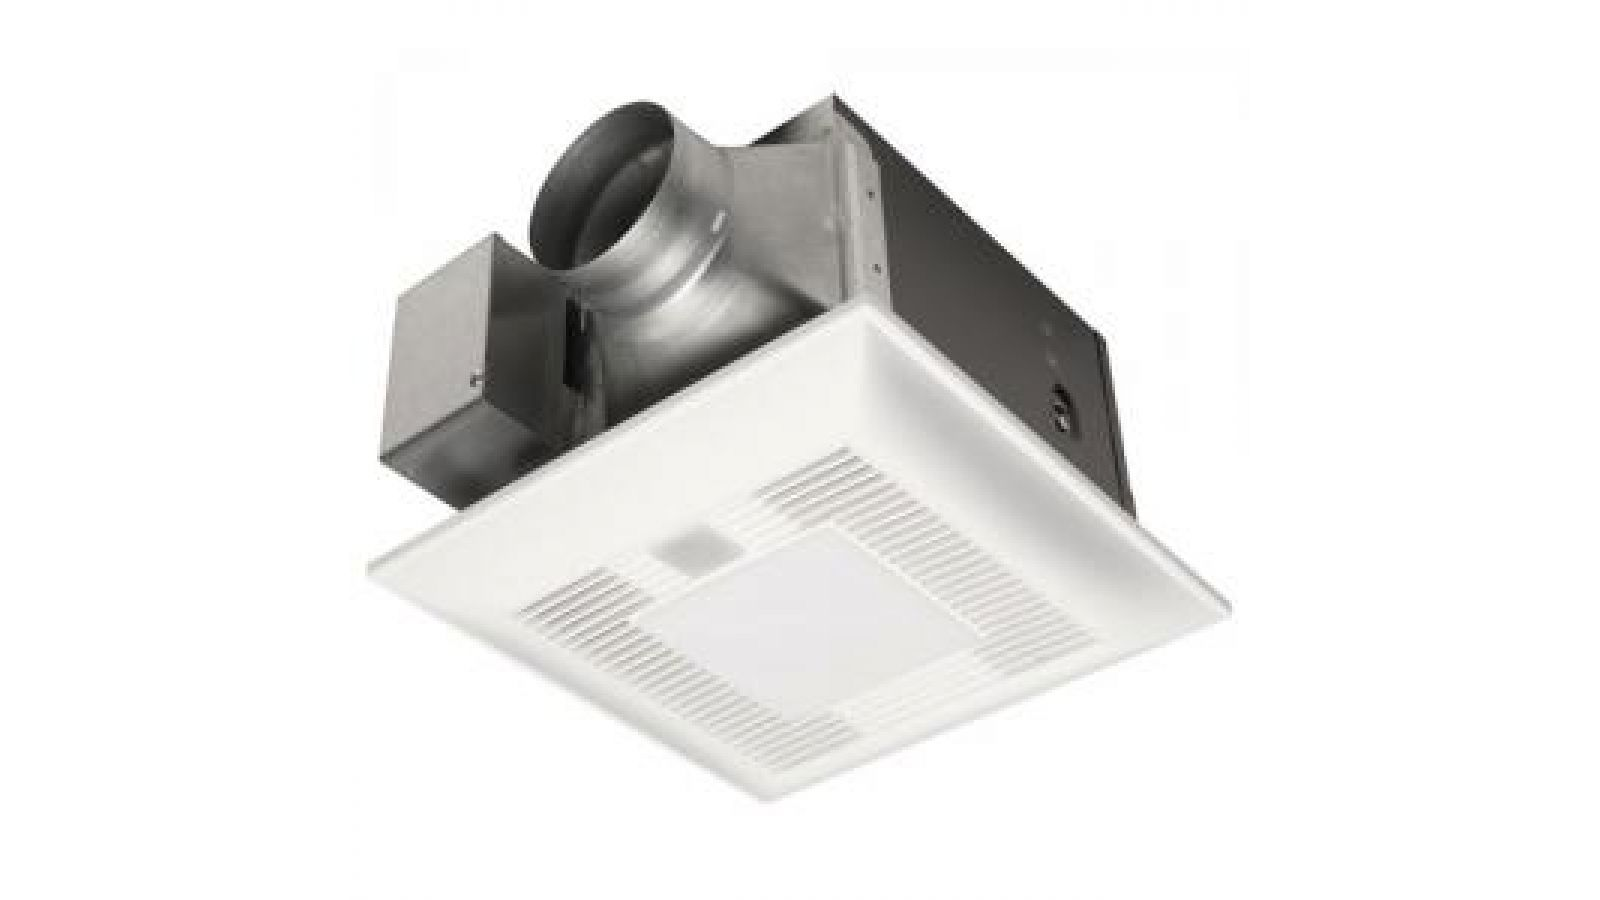 WhisperGreen-Lite FV-08VKML3 Ventilation Fan